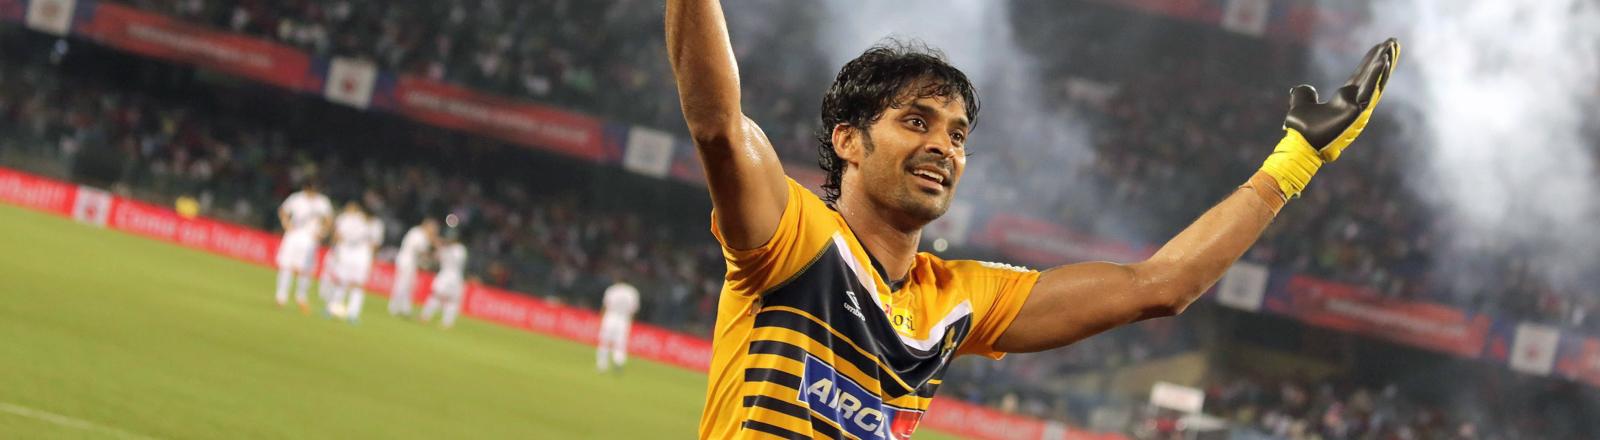 Suvasish Roychowdhury feiert am 12.10.2014 den Sieg seines Team  Atlético de Kolkota gegen Mumbai City.